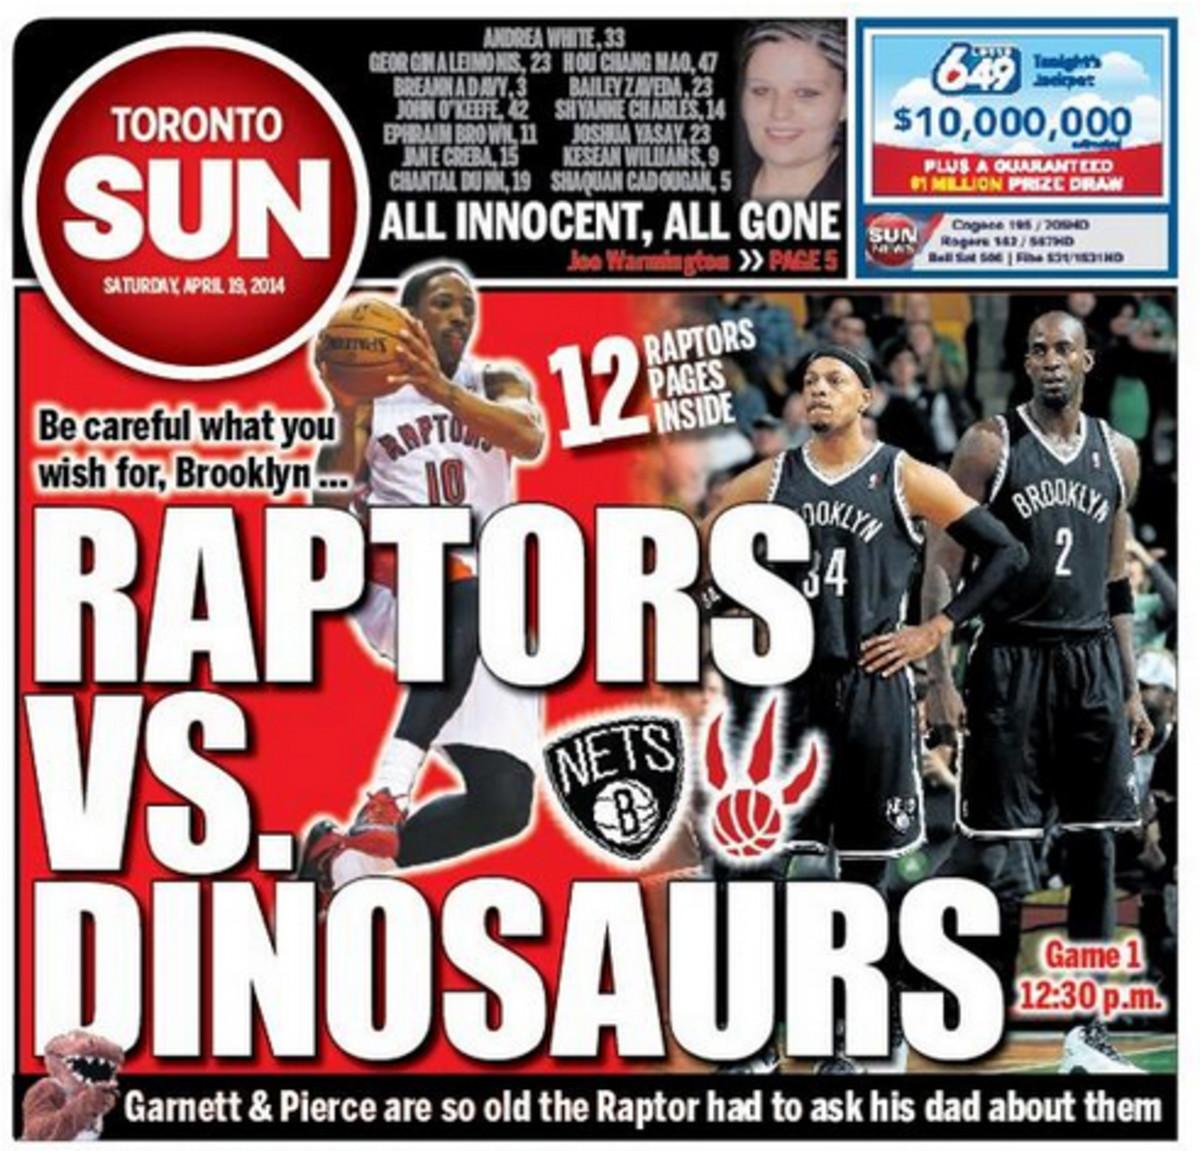 (Toronto Sun)